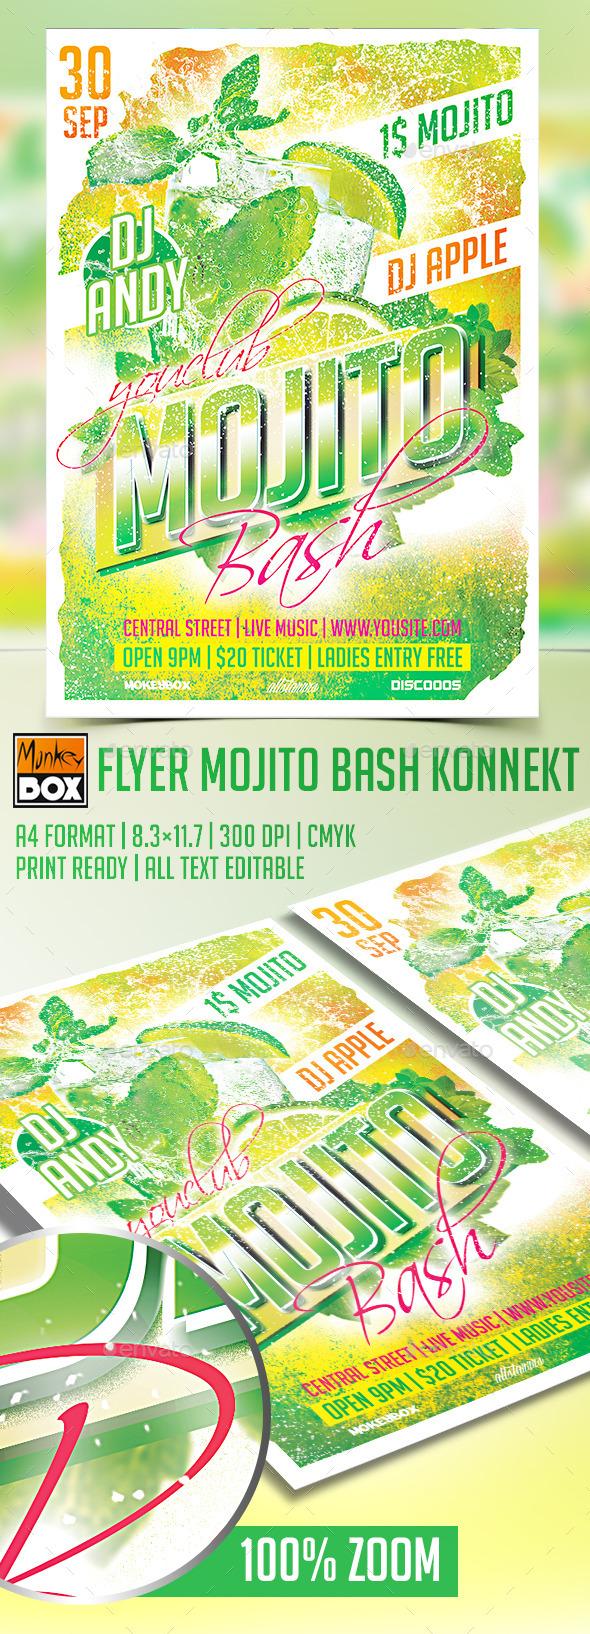 Flyer Mojito Bash Konnekt - Clubs & Parties Events